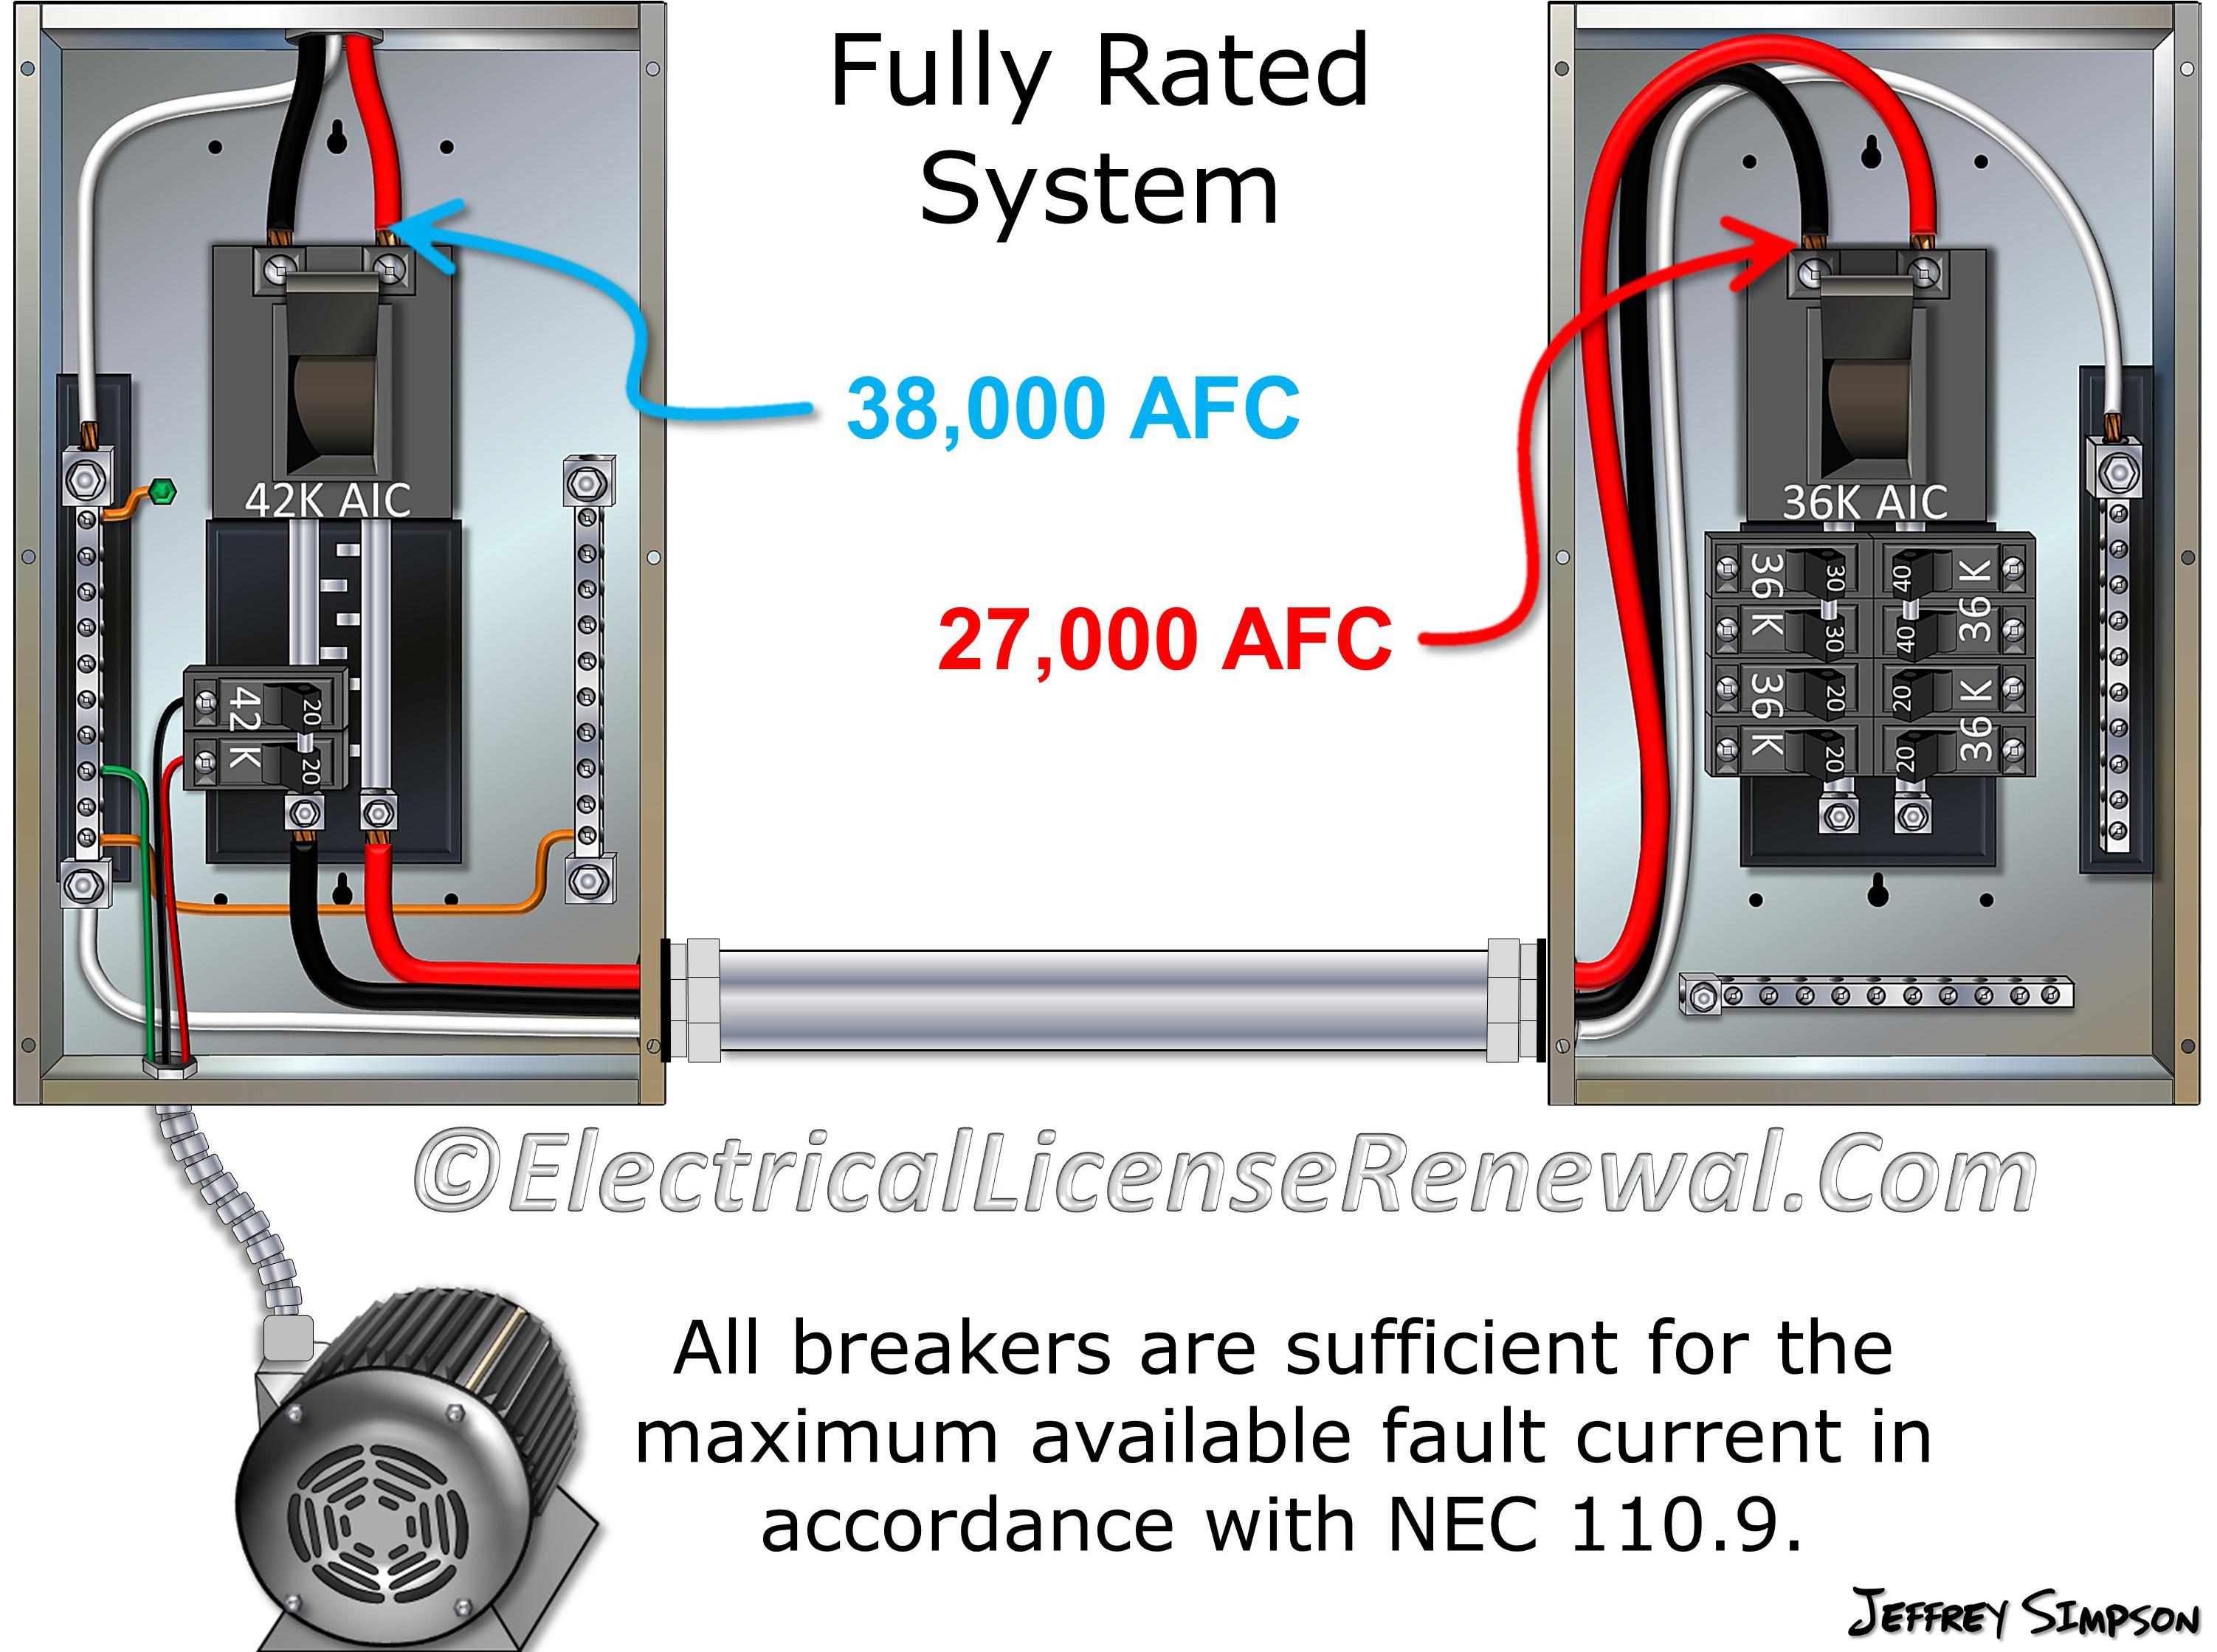 nec phone system wiring diagram